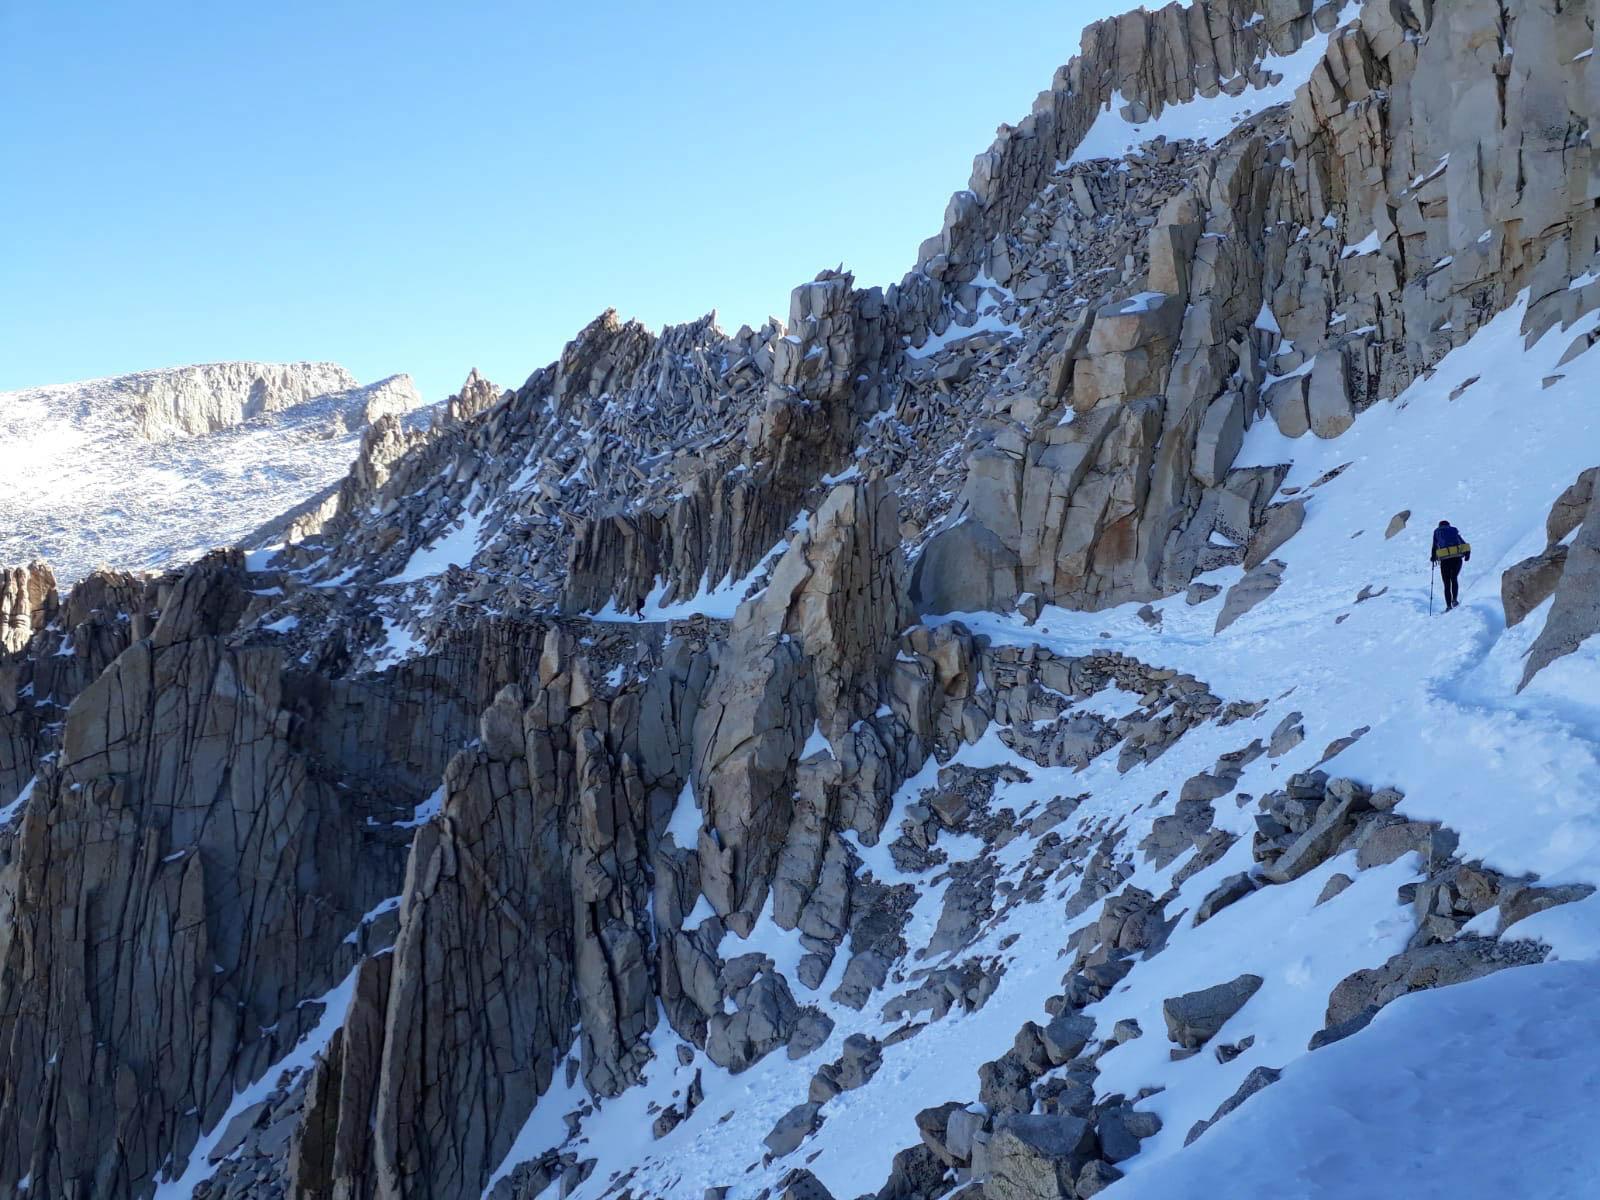 Side Trail zum Mount Whitney